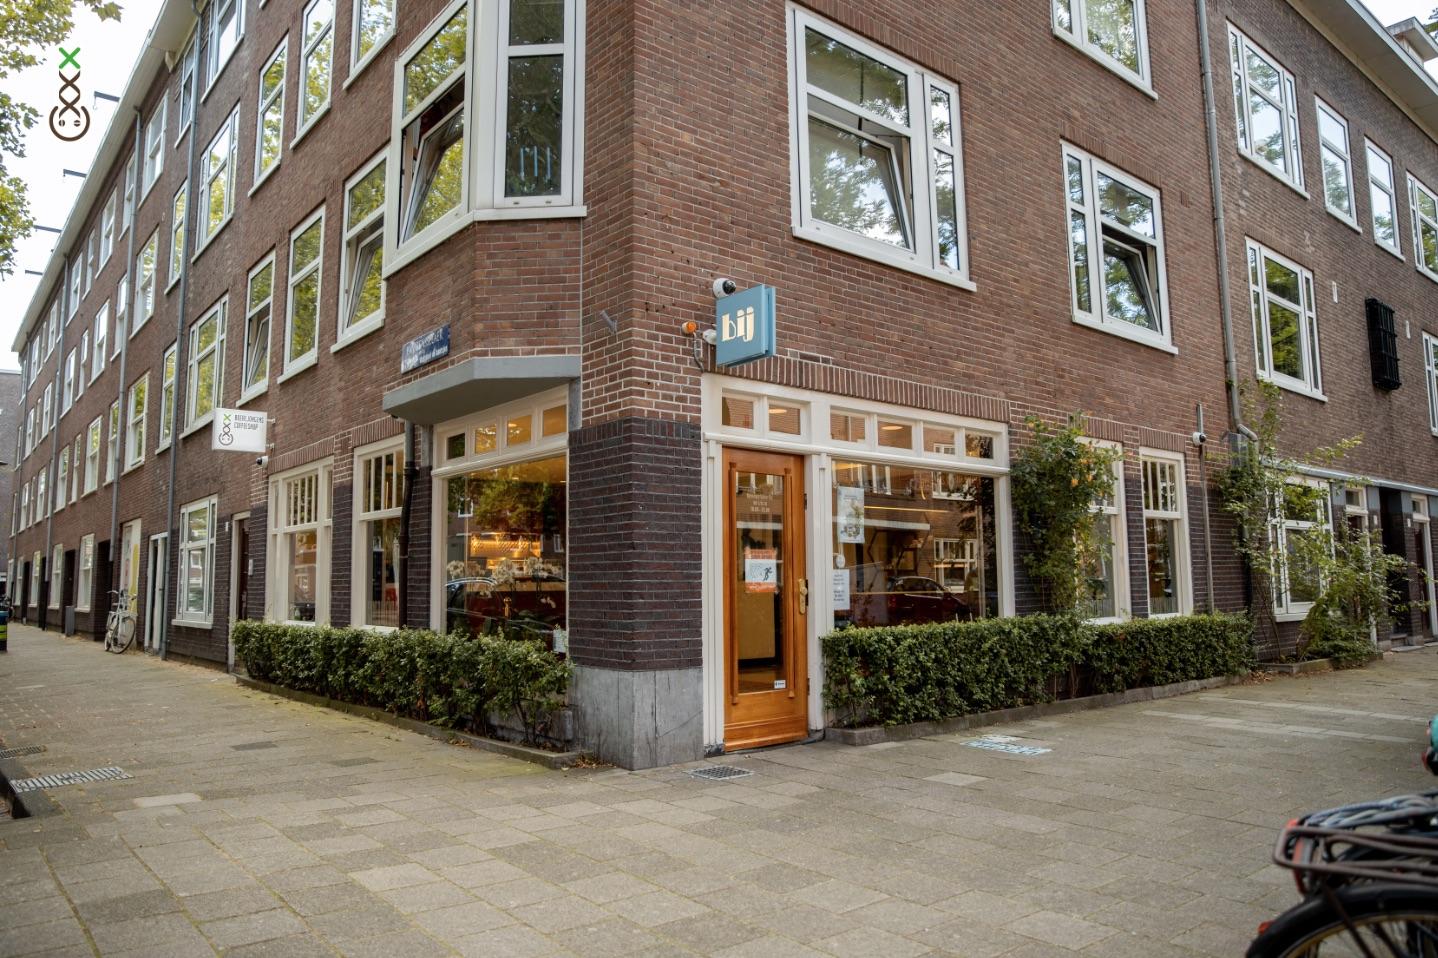 Boerejongens Coffeeshops spread visitor numbers to stop coronavirus